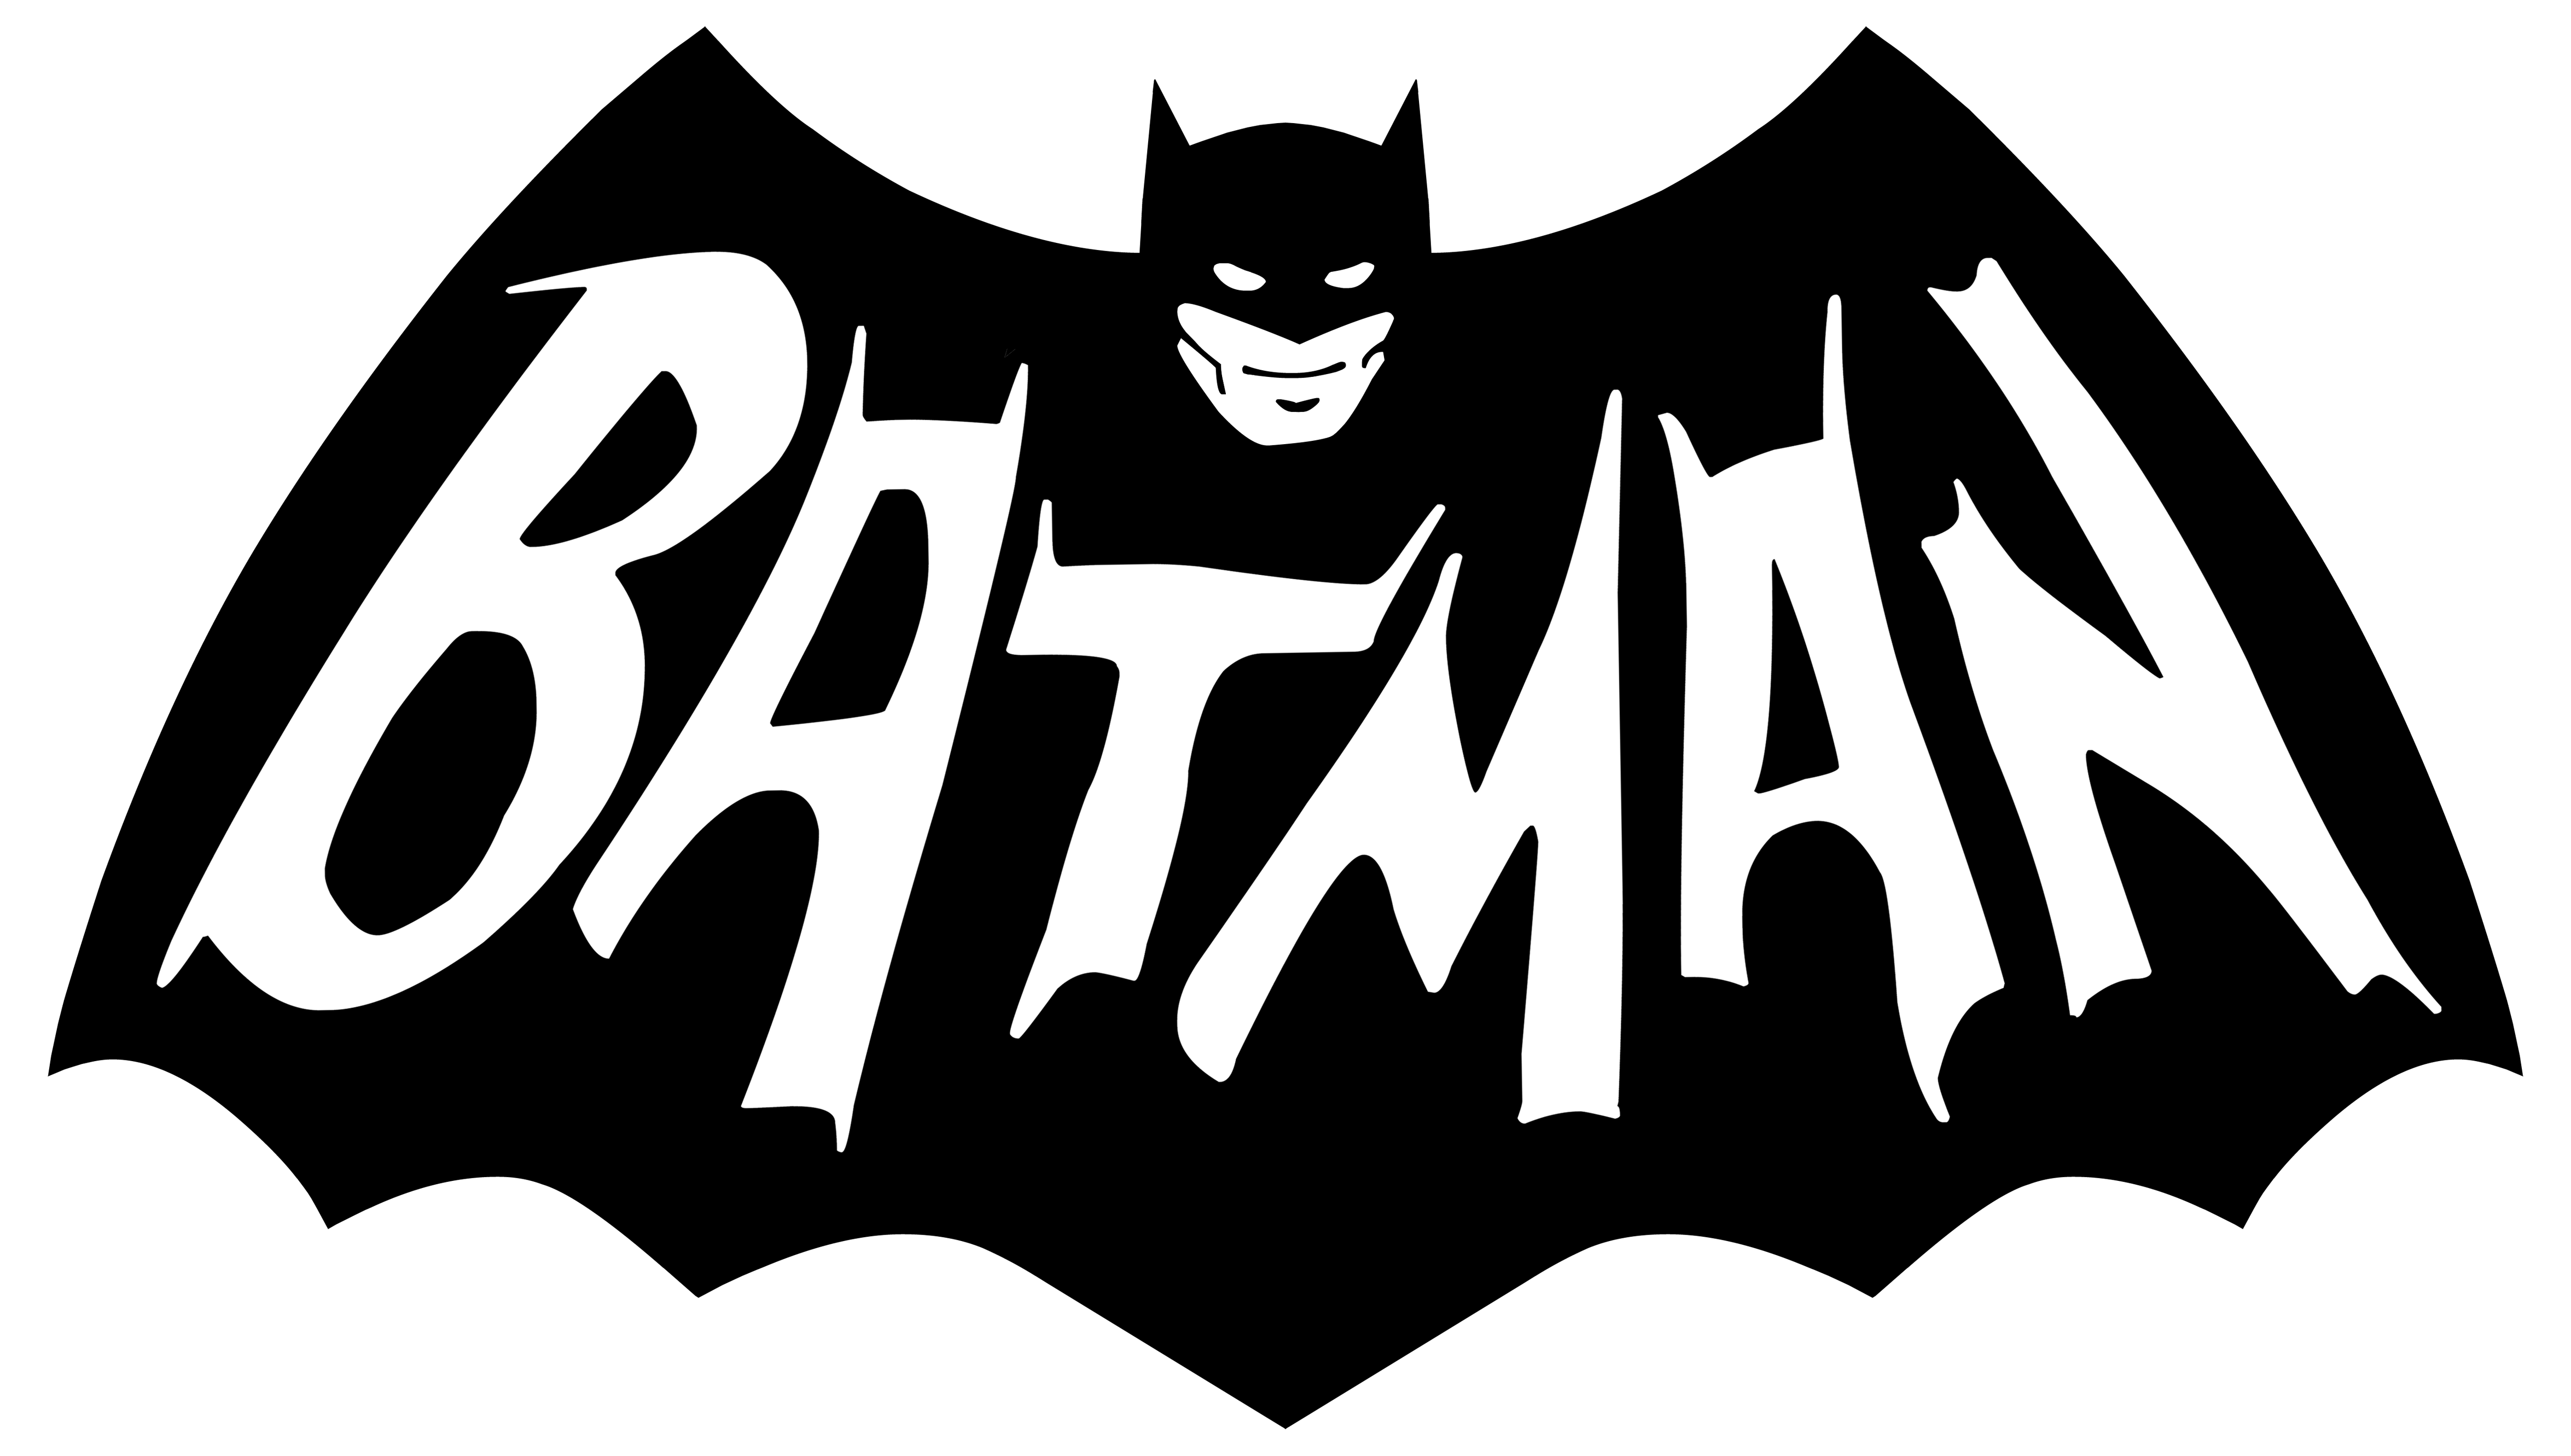 batman logo tv series 1966 1968 by jamesng8 on deviantart 1968